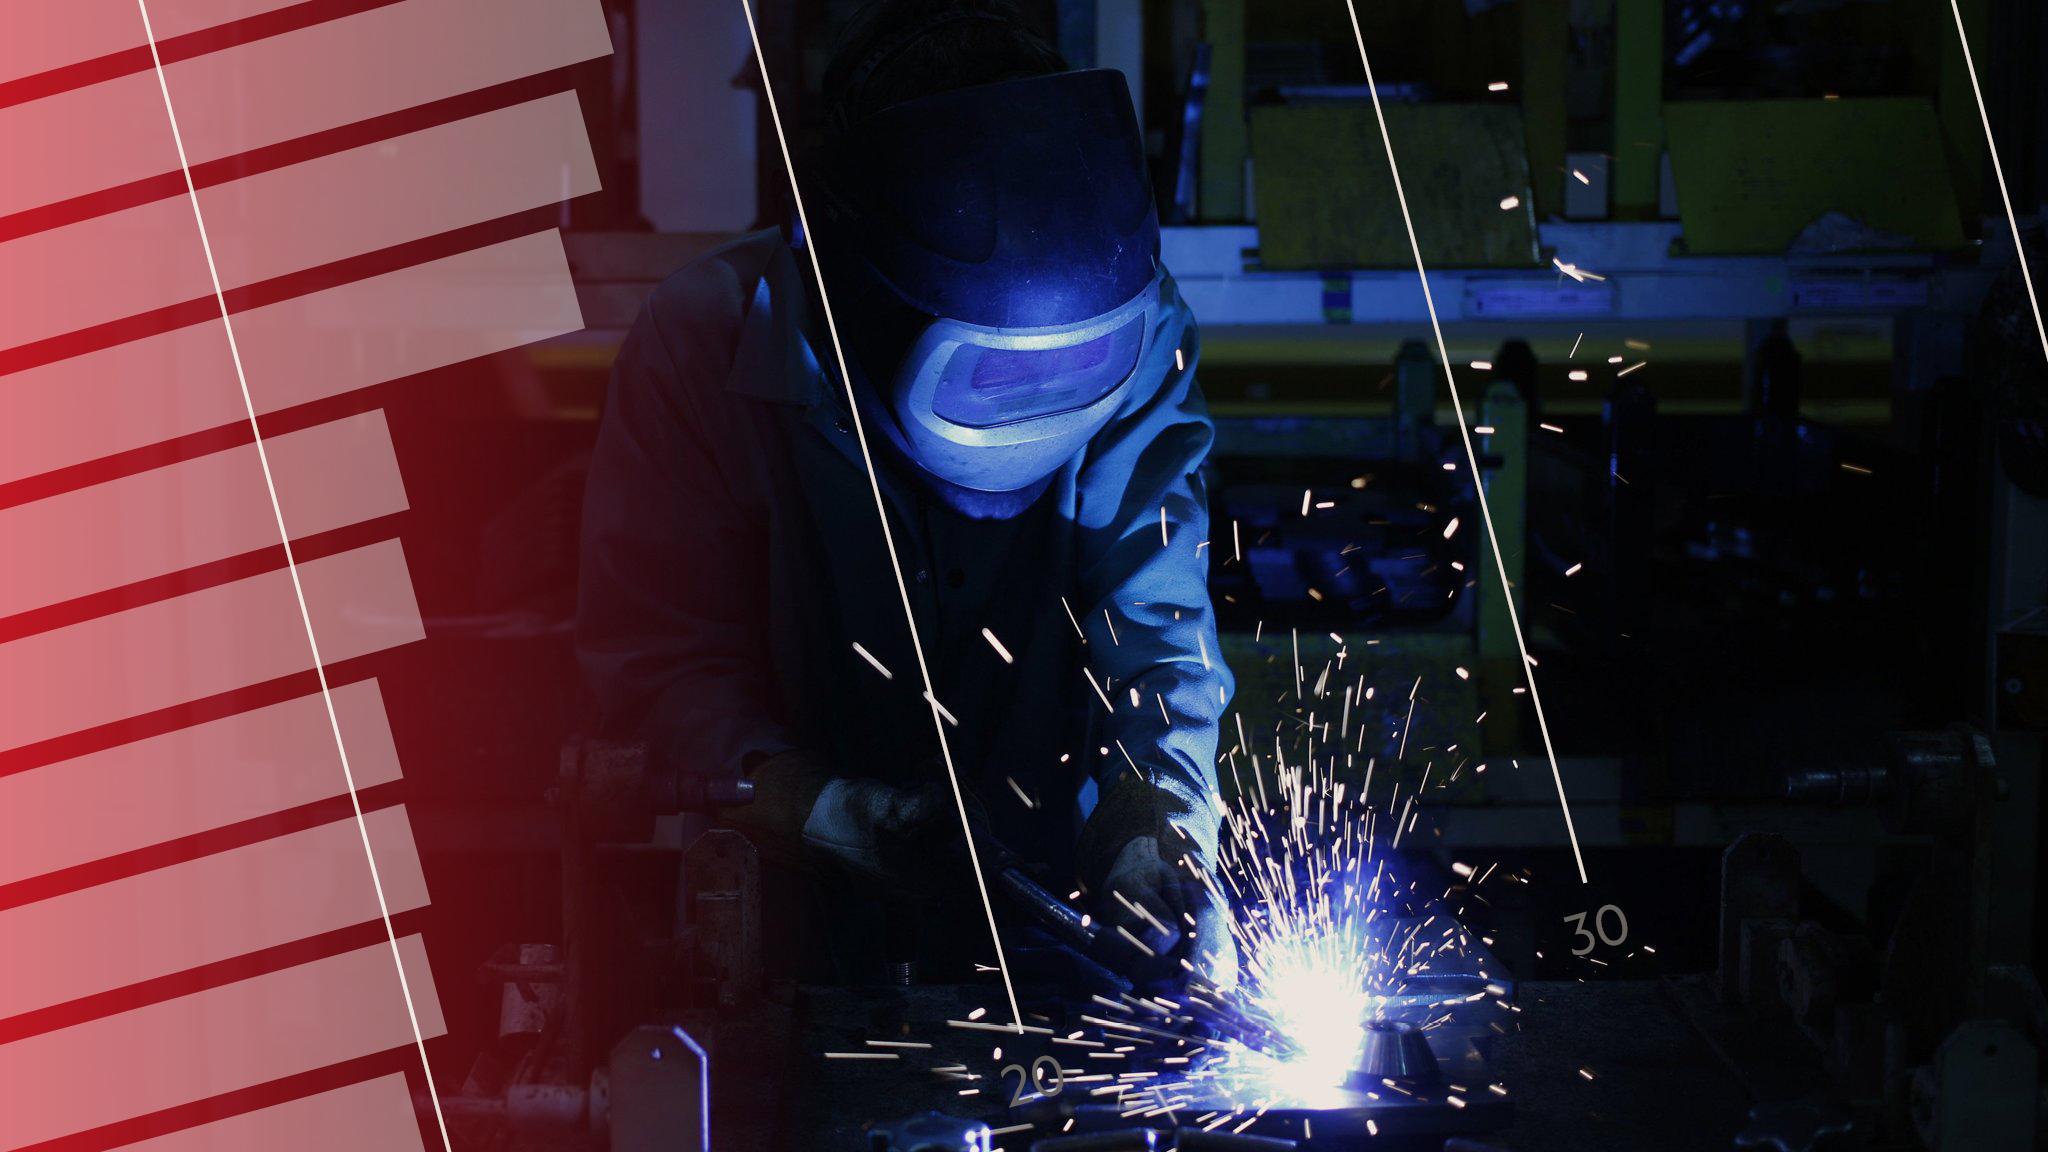 US factories feel chilling effect of tariffs will halt revival